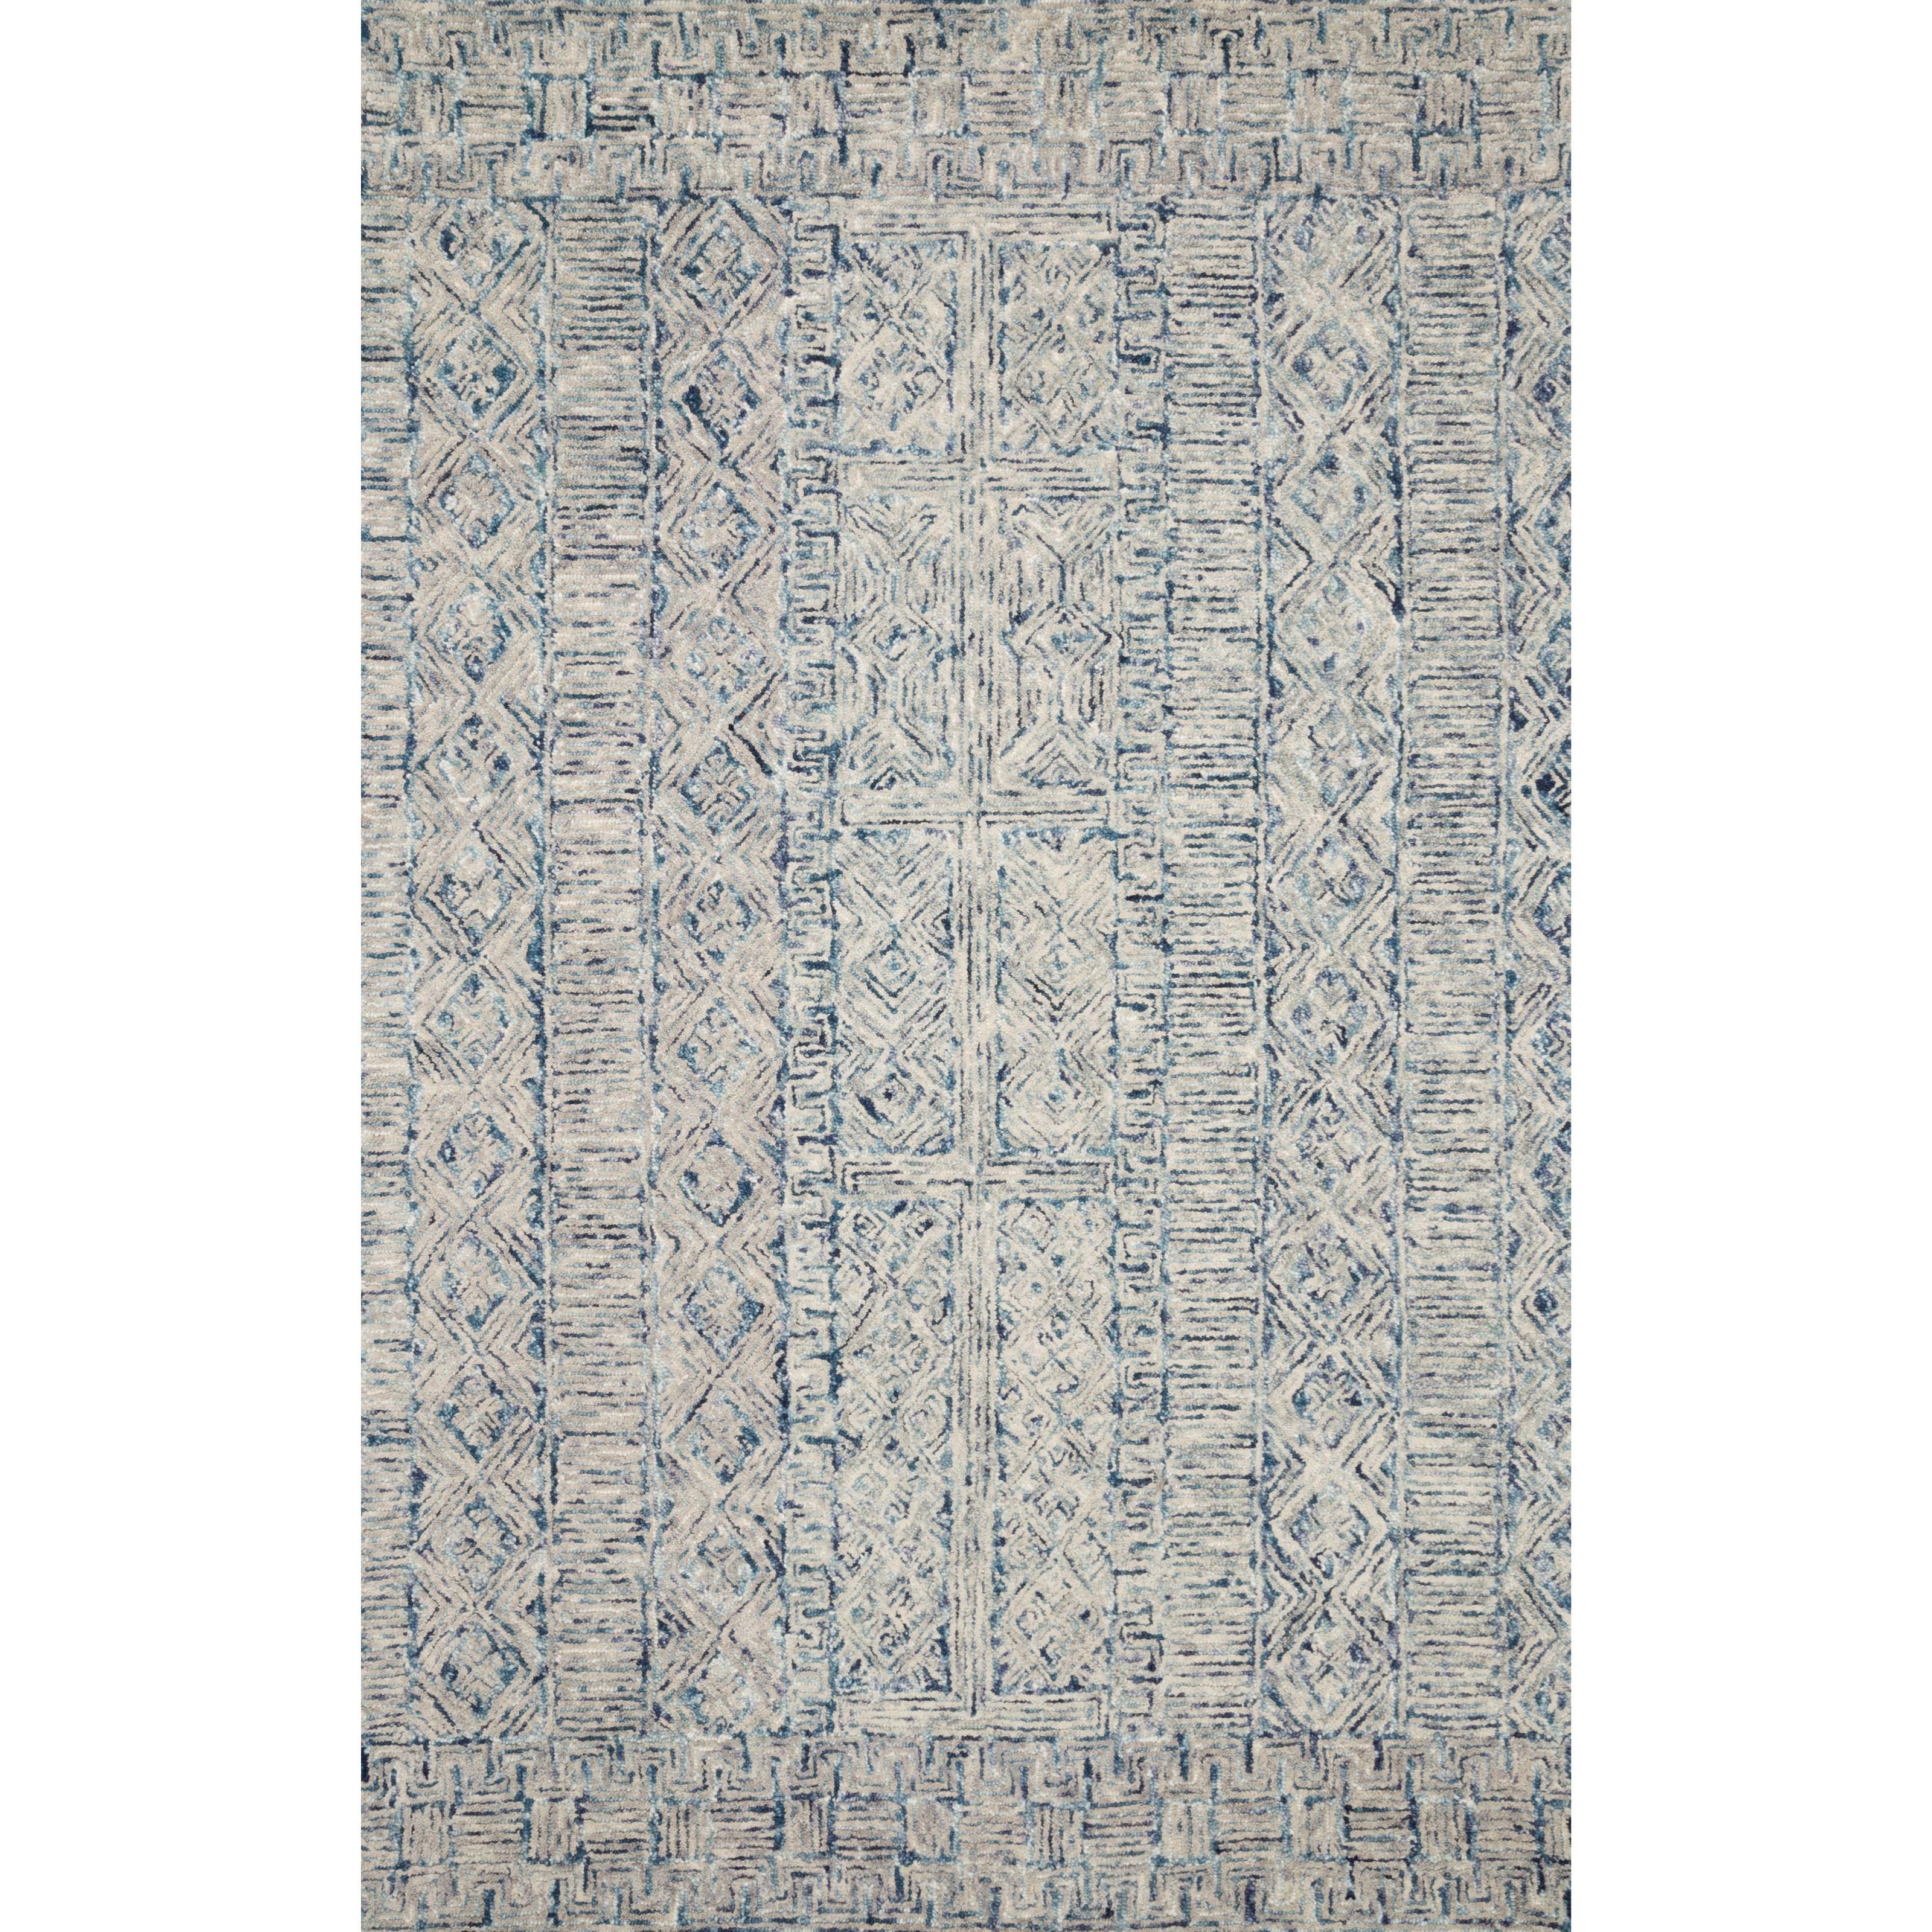 "Peregrine 11'6"" x 15' Ocean Rug by Loloi Rugs at Sprintz Furniture"